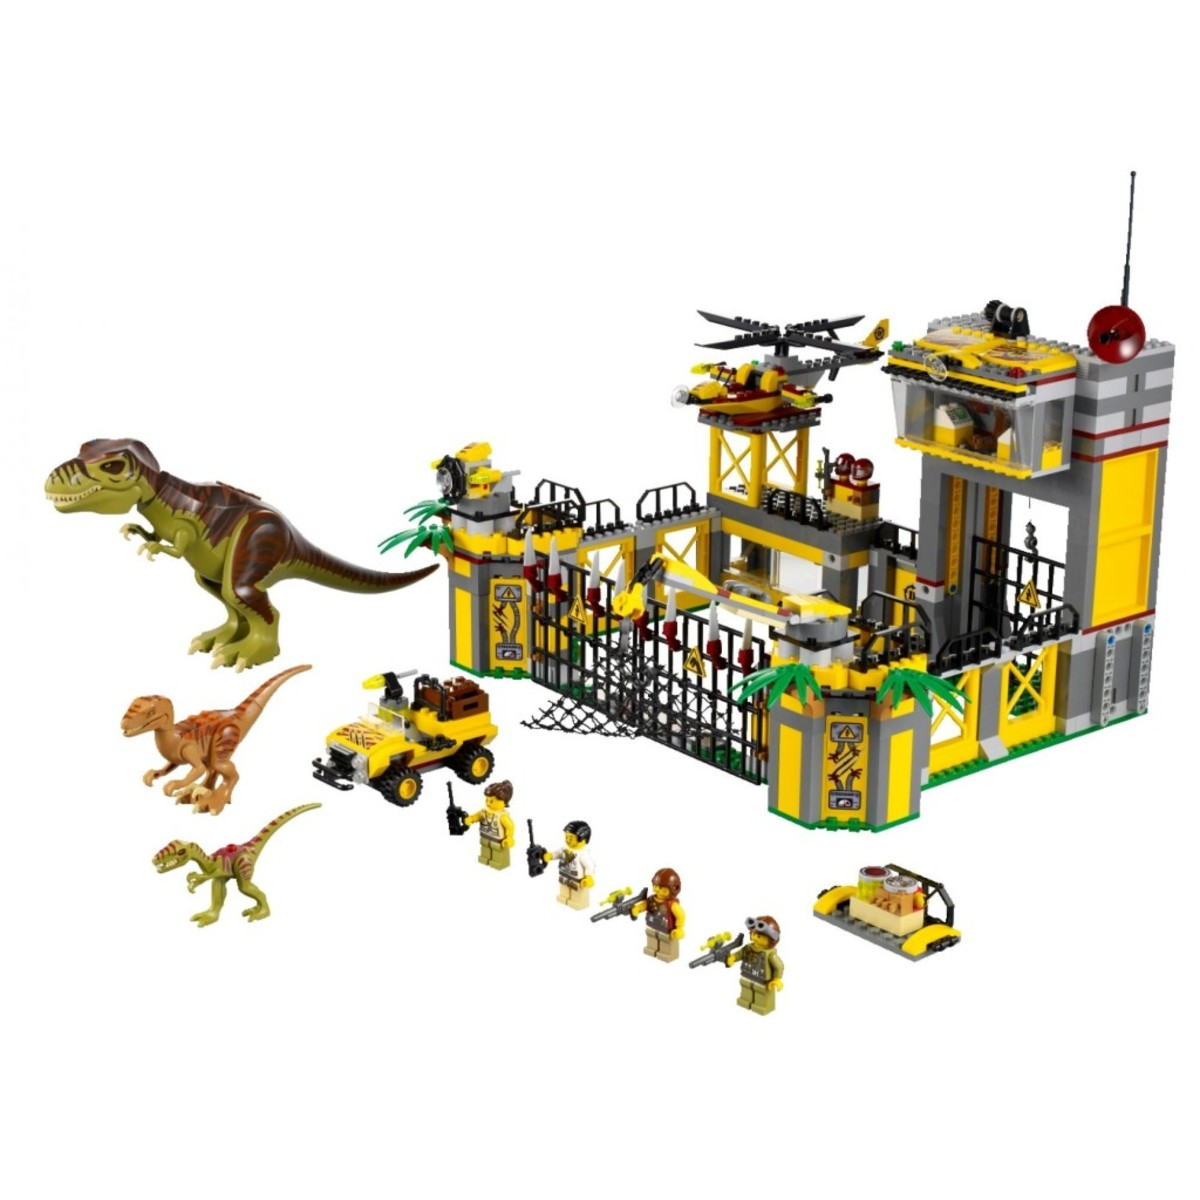 LEGO Dino Dino Defense HQ 5887 Assembled